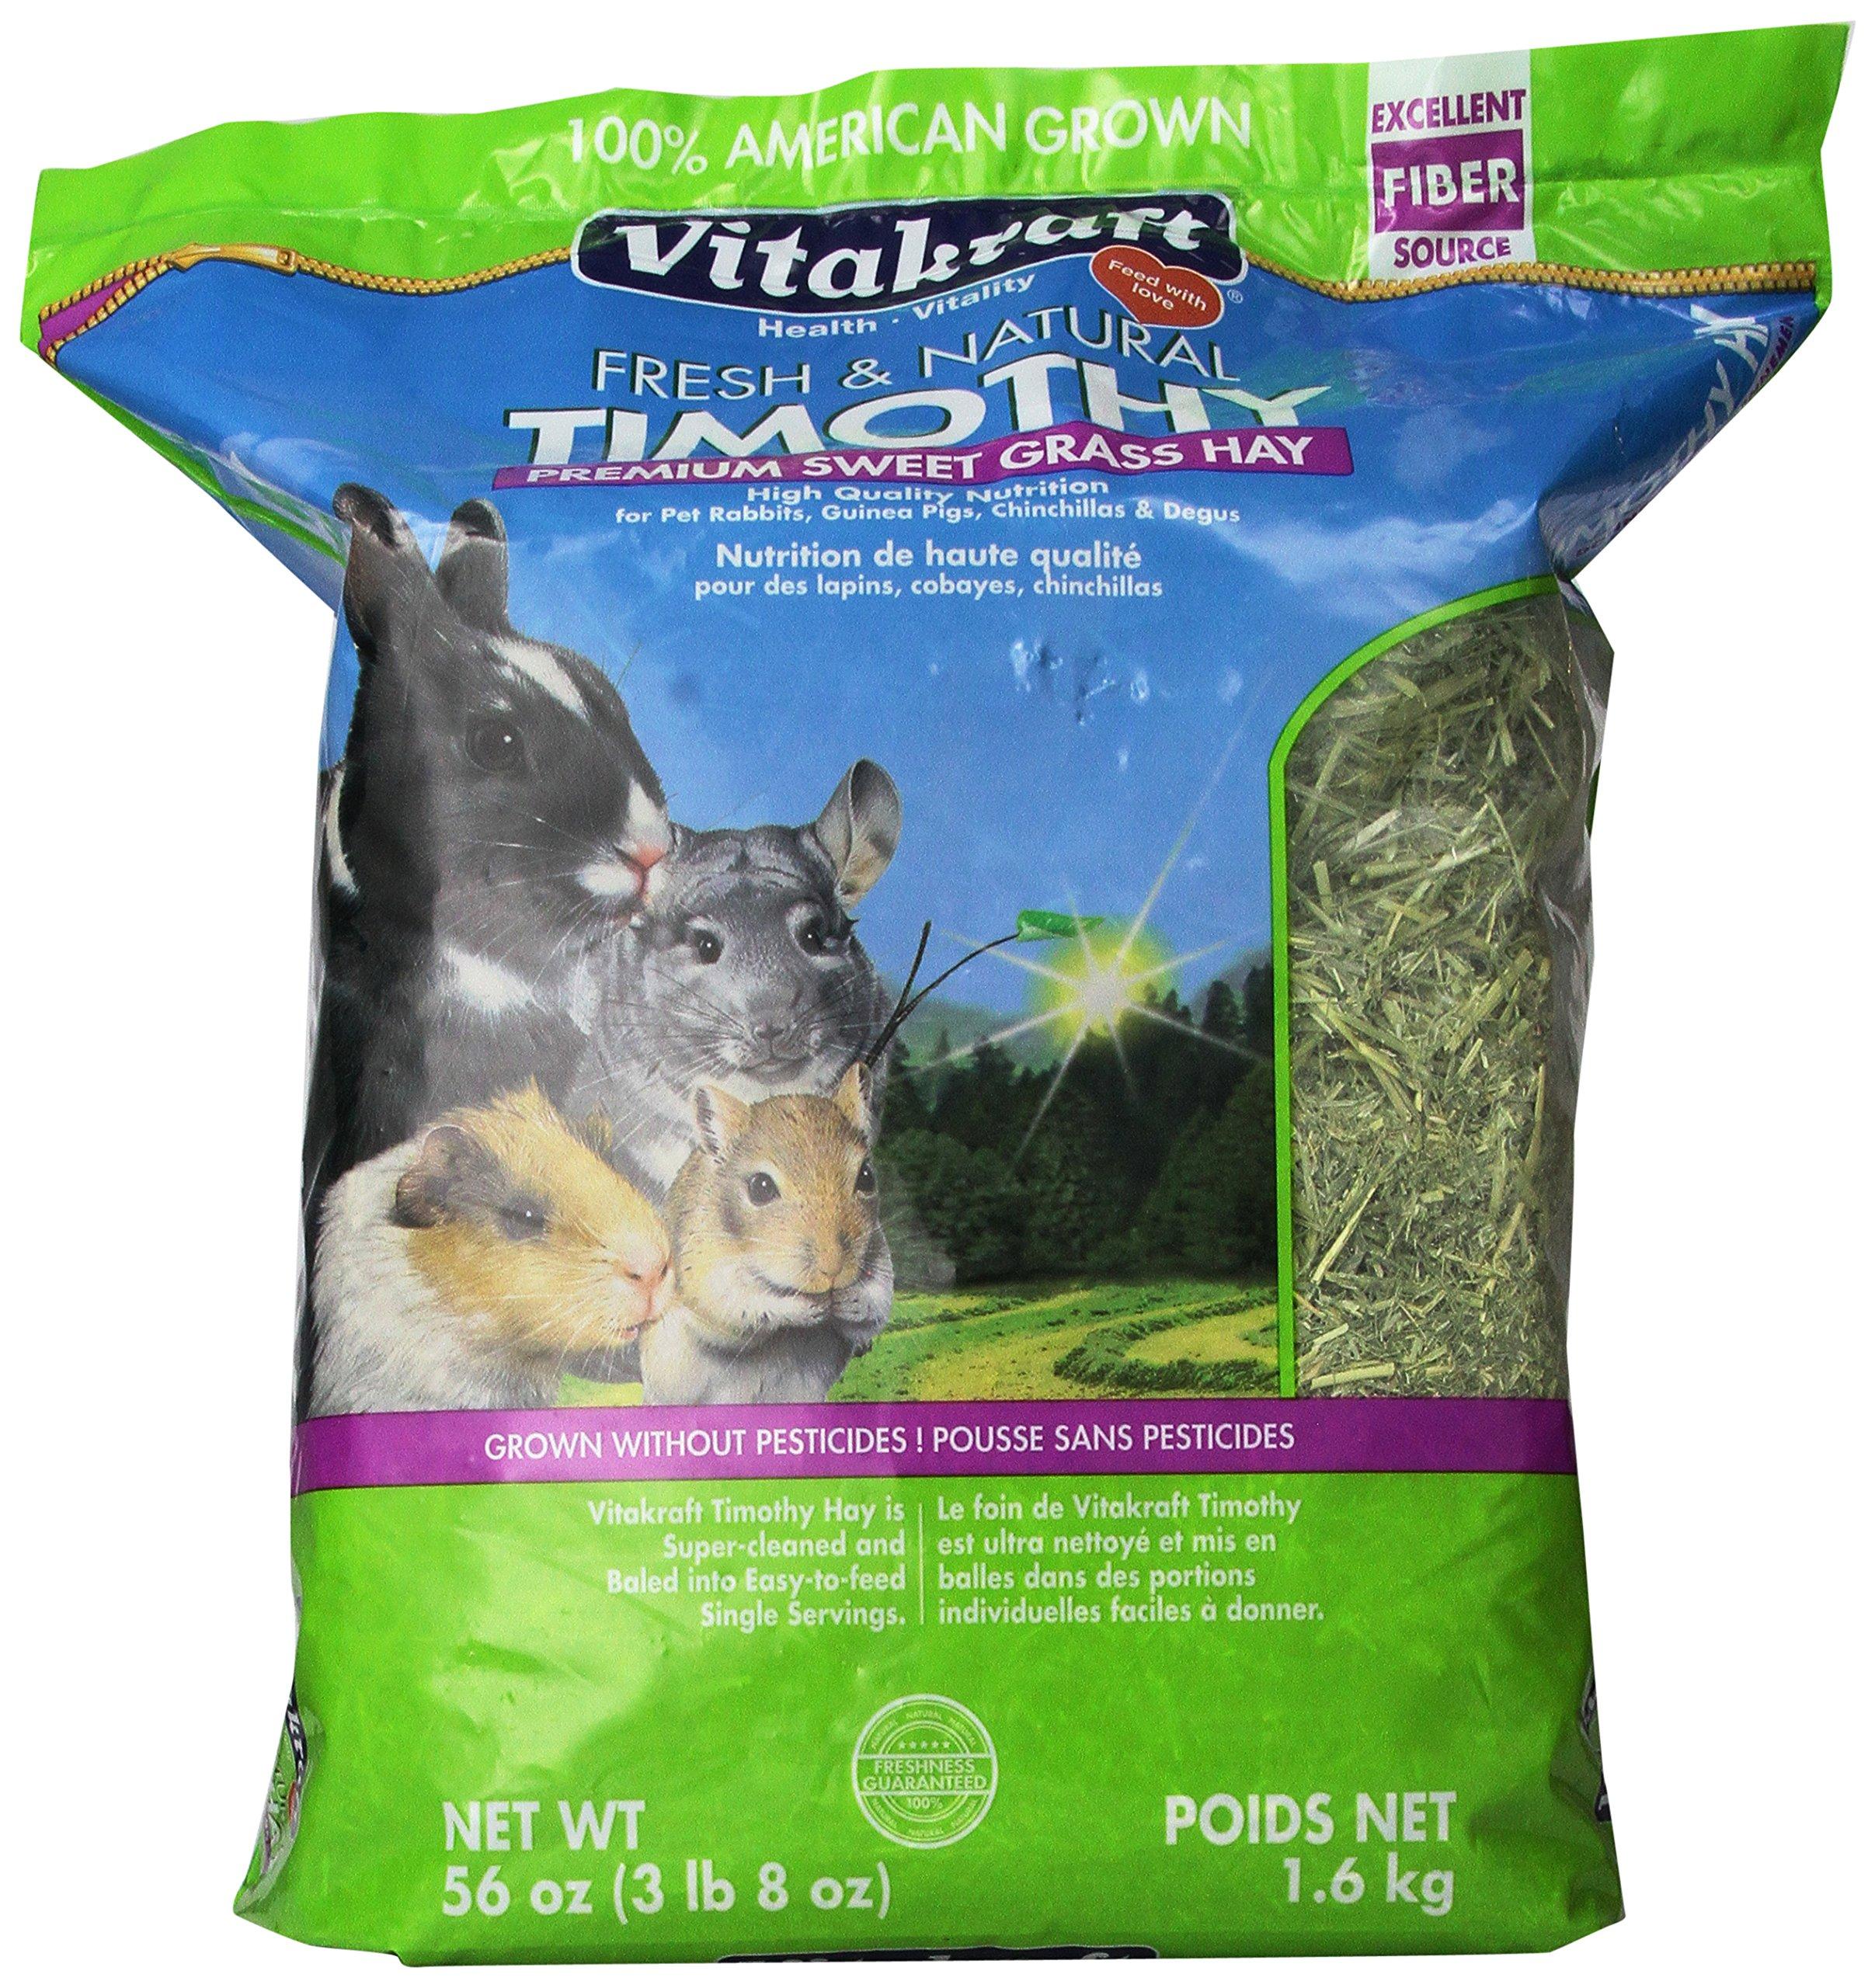 Vitakraft Timothy Hay, Premium Sweet Grass Hay, 100% American Grown, 56 Ounce Resealable Bag